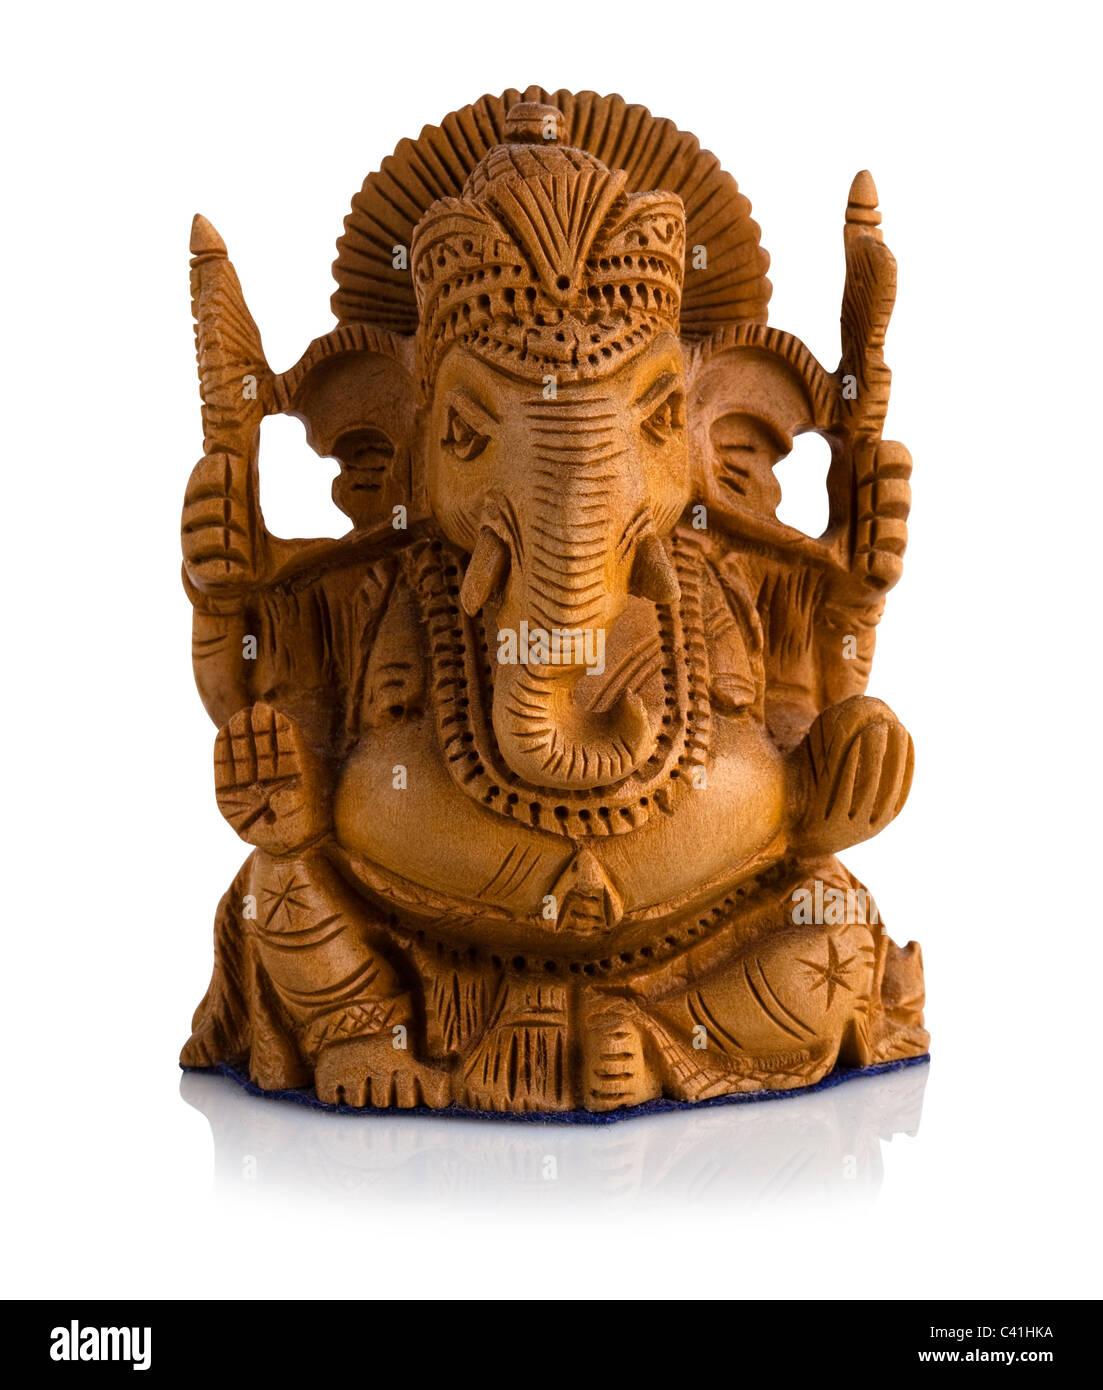 Sandalwood statue of Ganesha - Stock Image